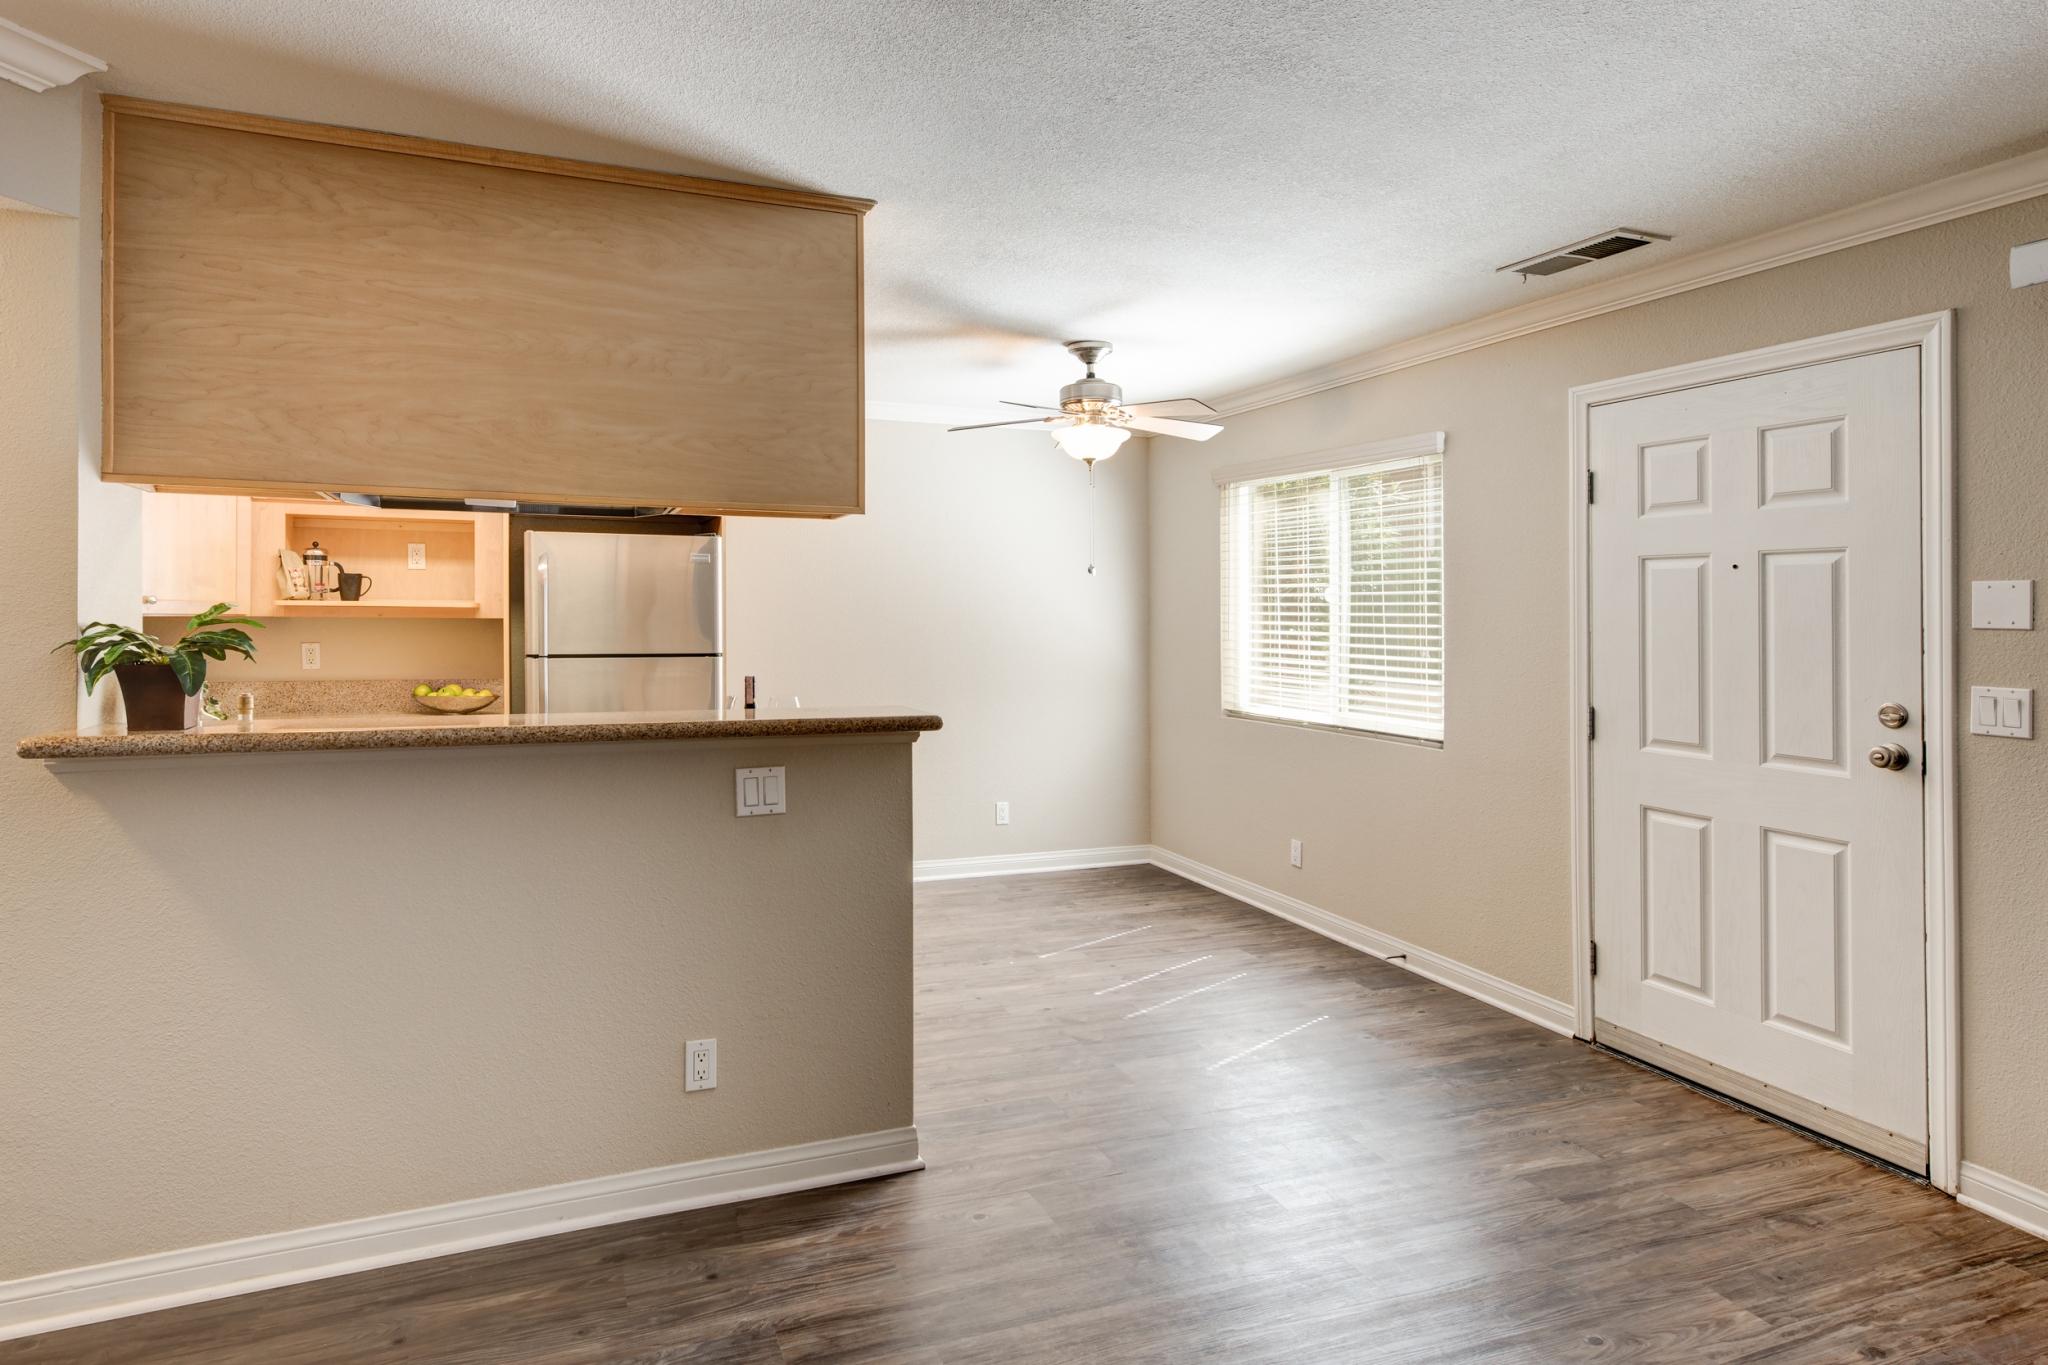 Image of Ceramic Tile & Hardwood Style Flooring for Artesia